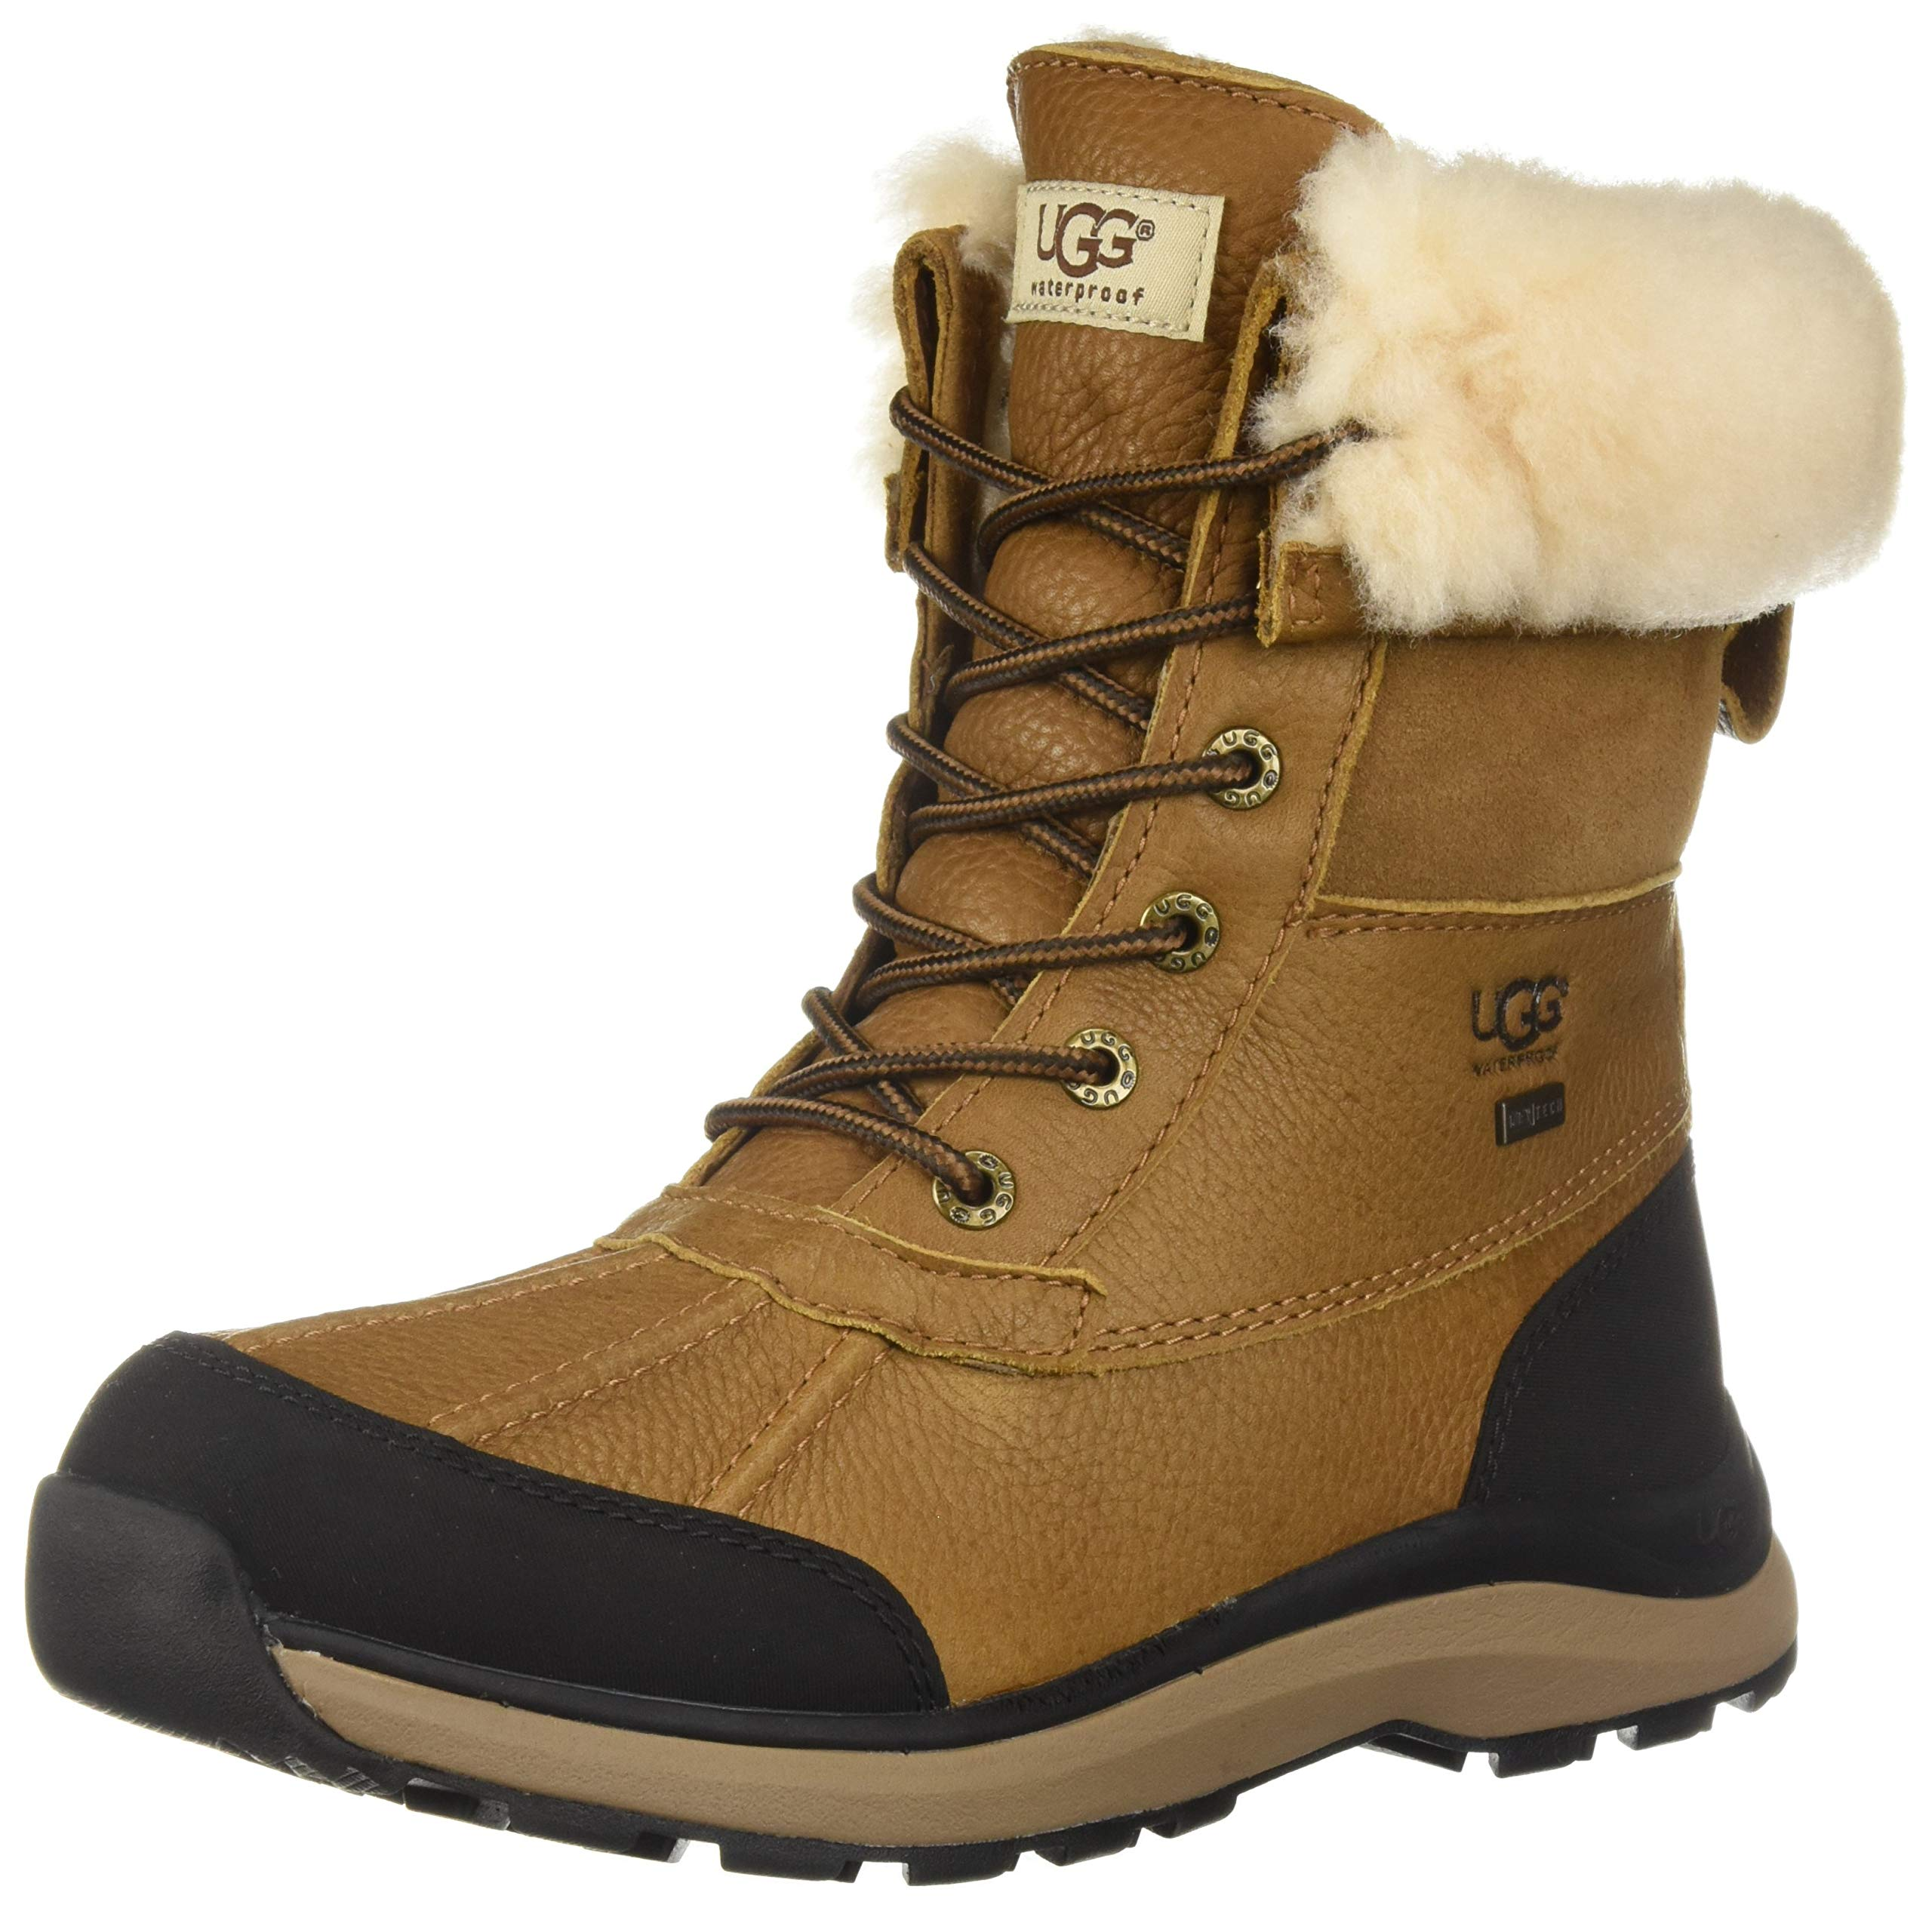 UGG Women's W Adirondack Boot III Snow, Chestnut, 7 M US by UGG